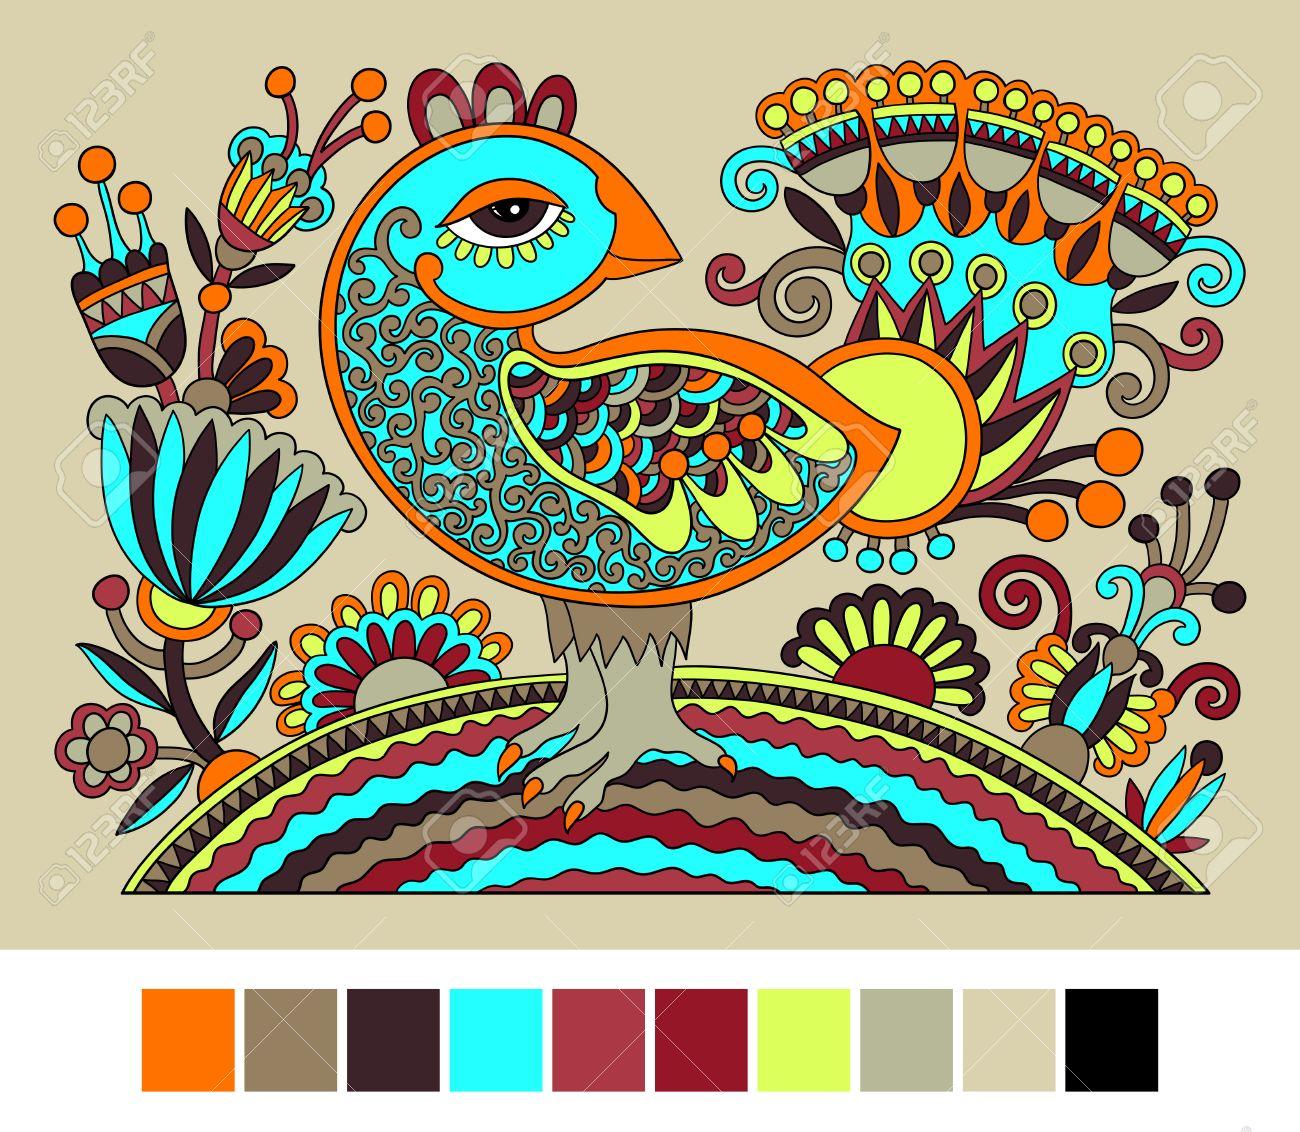 Dibujado A Mano Original Ucraniano Patron Decorativo Etnico Con Aves